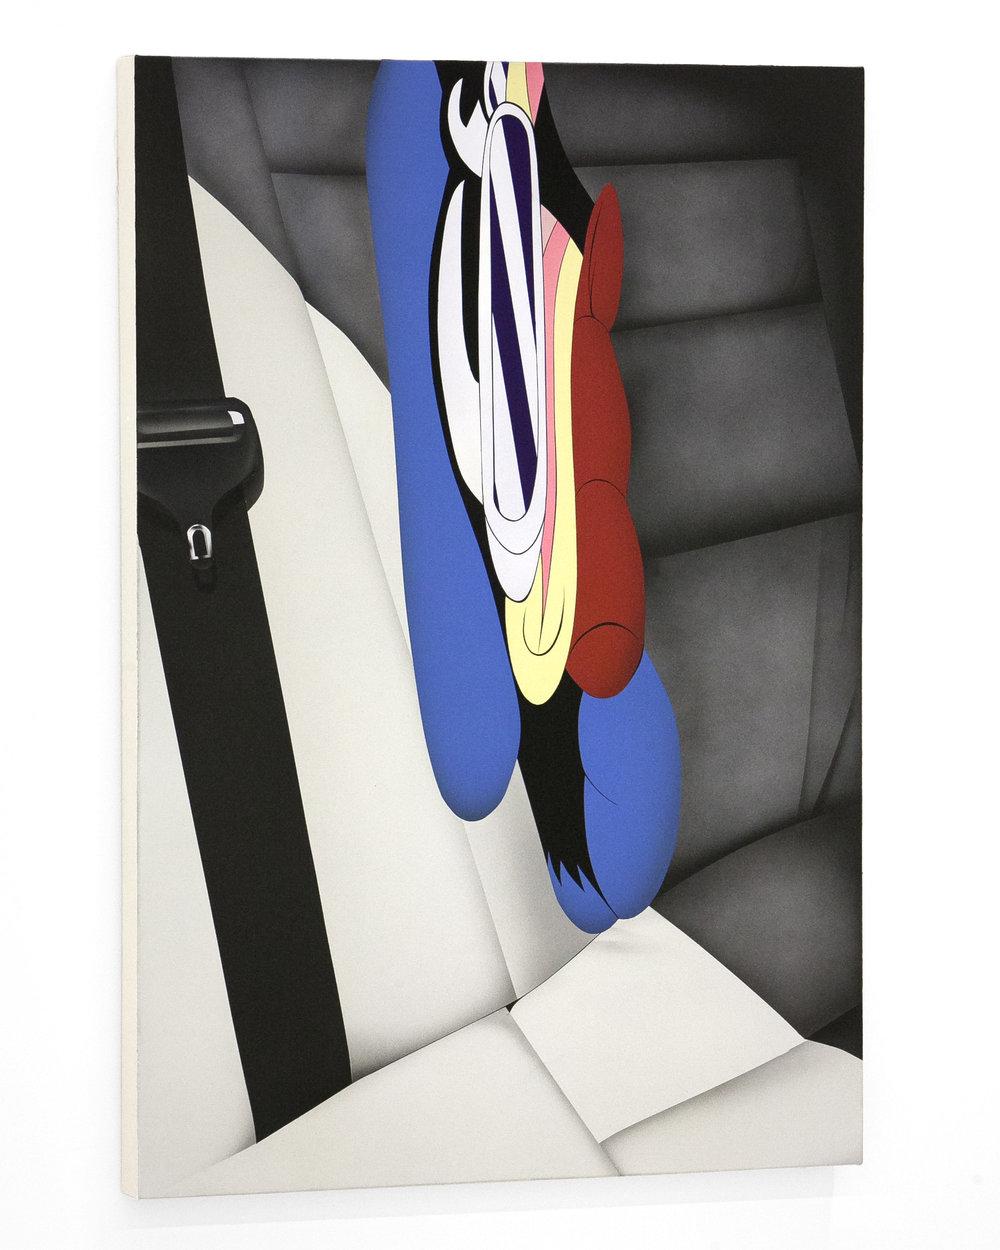 aej_backseat_canvas_5.jpg